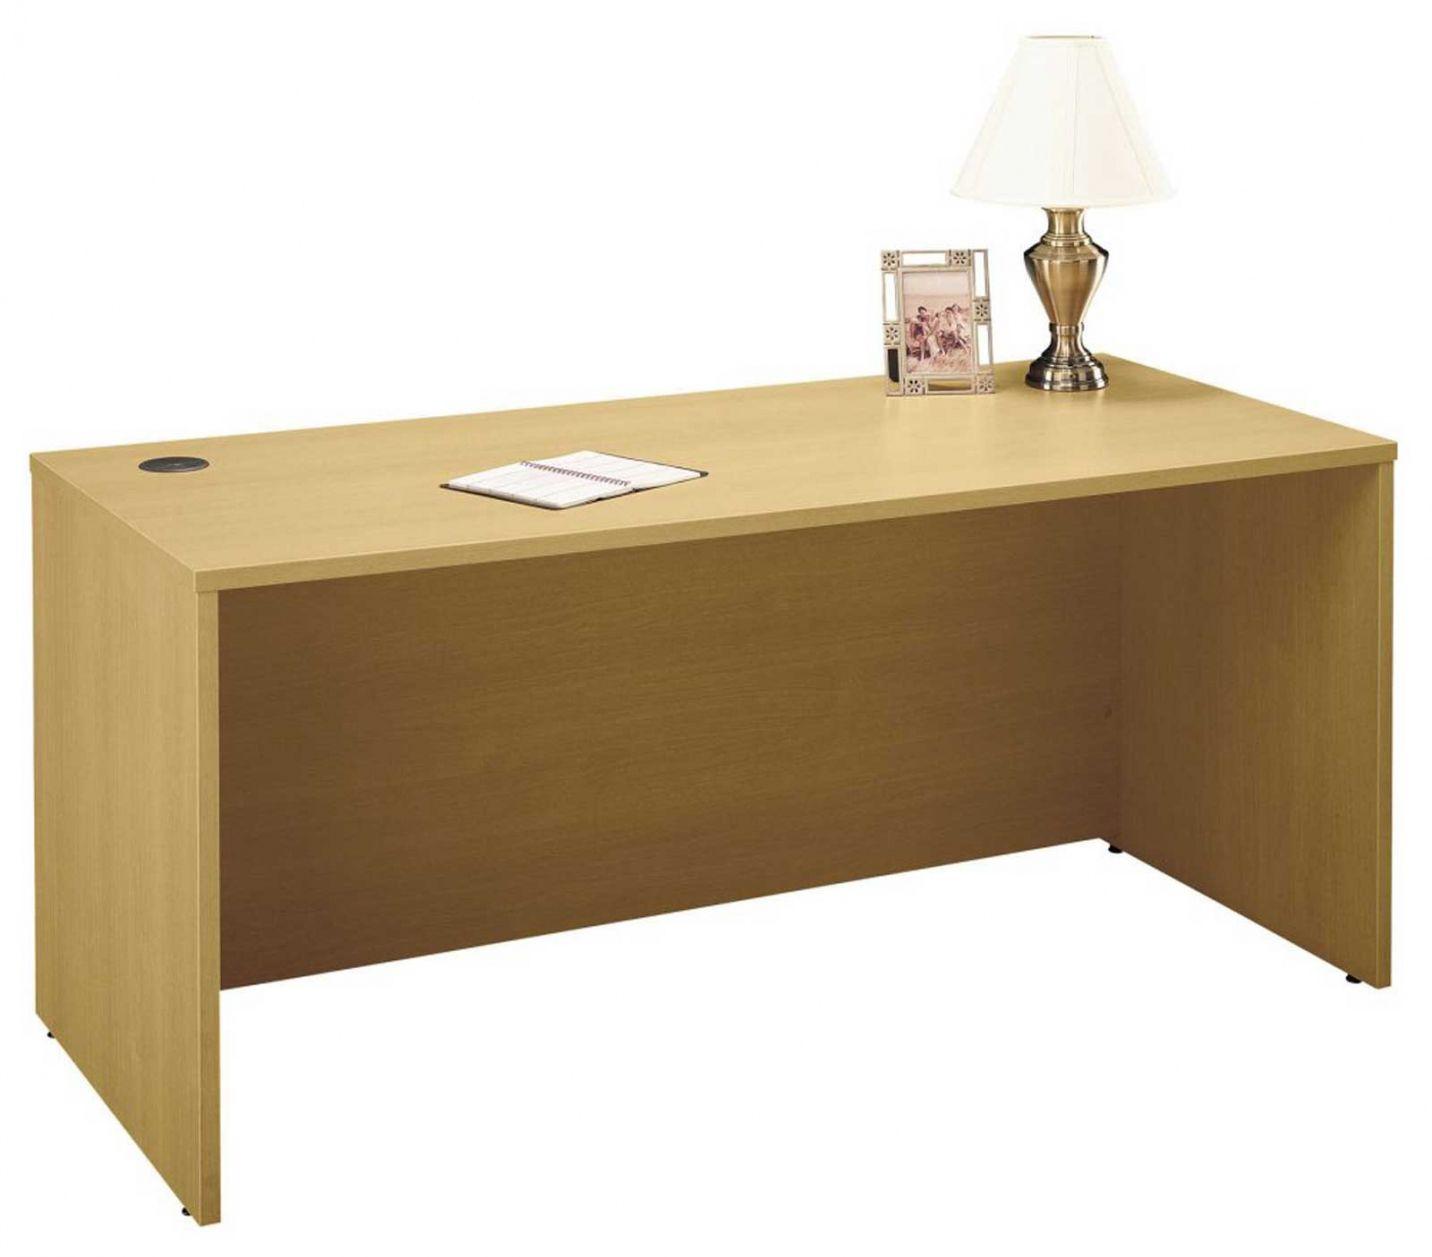 Light Oak Office Desk Modern Home Furniture Check More At Http